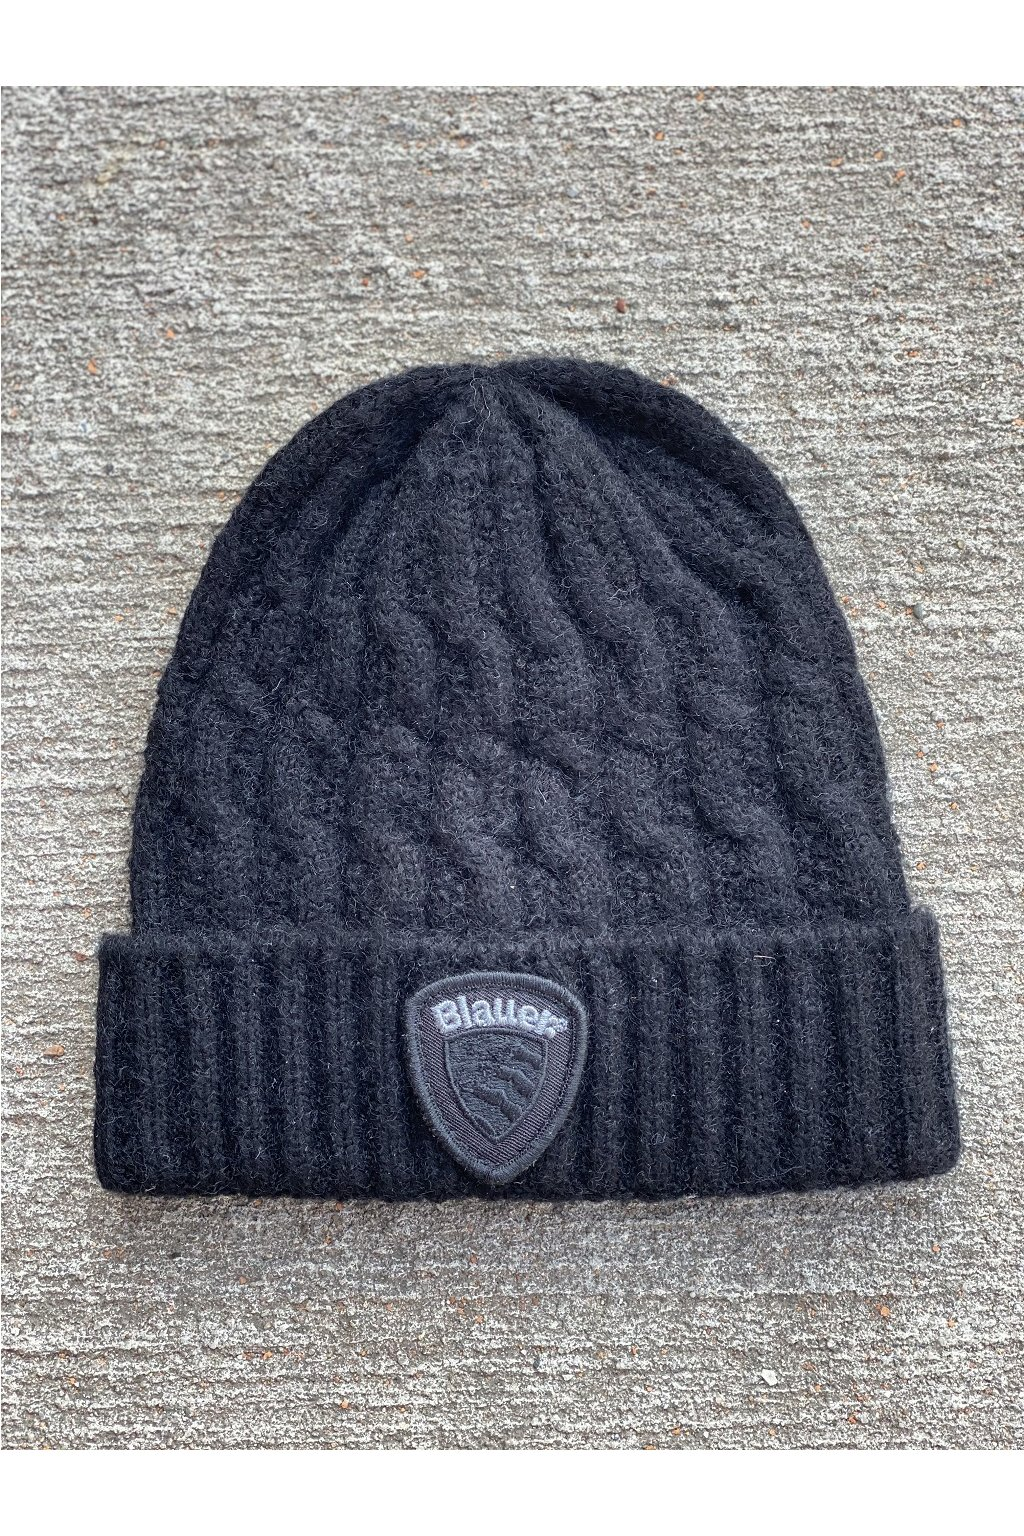 Dámská čepice Blauer 21WBLDA05391 černá